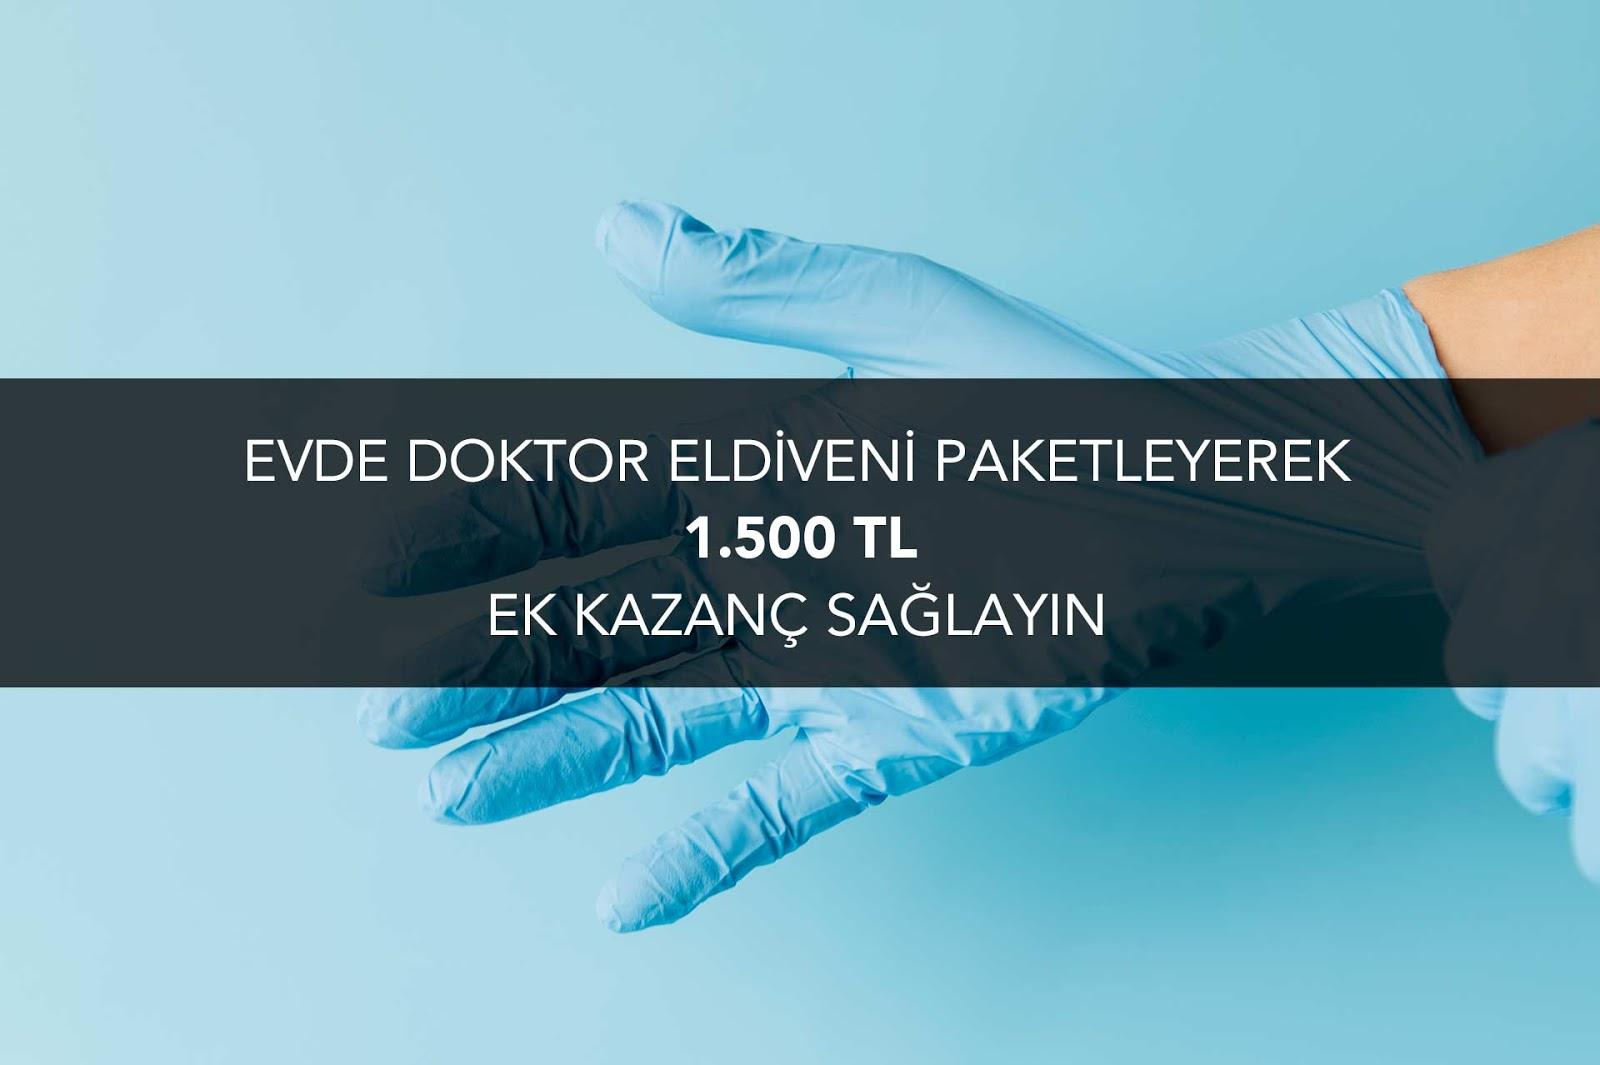 evde-doktor-eldiveni-paketleme-isi